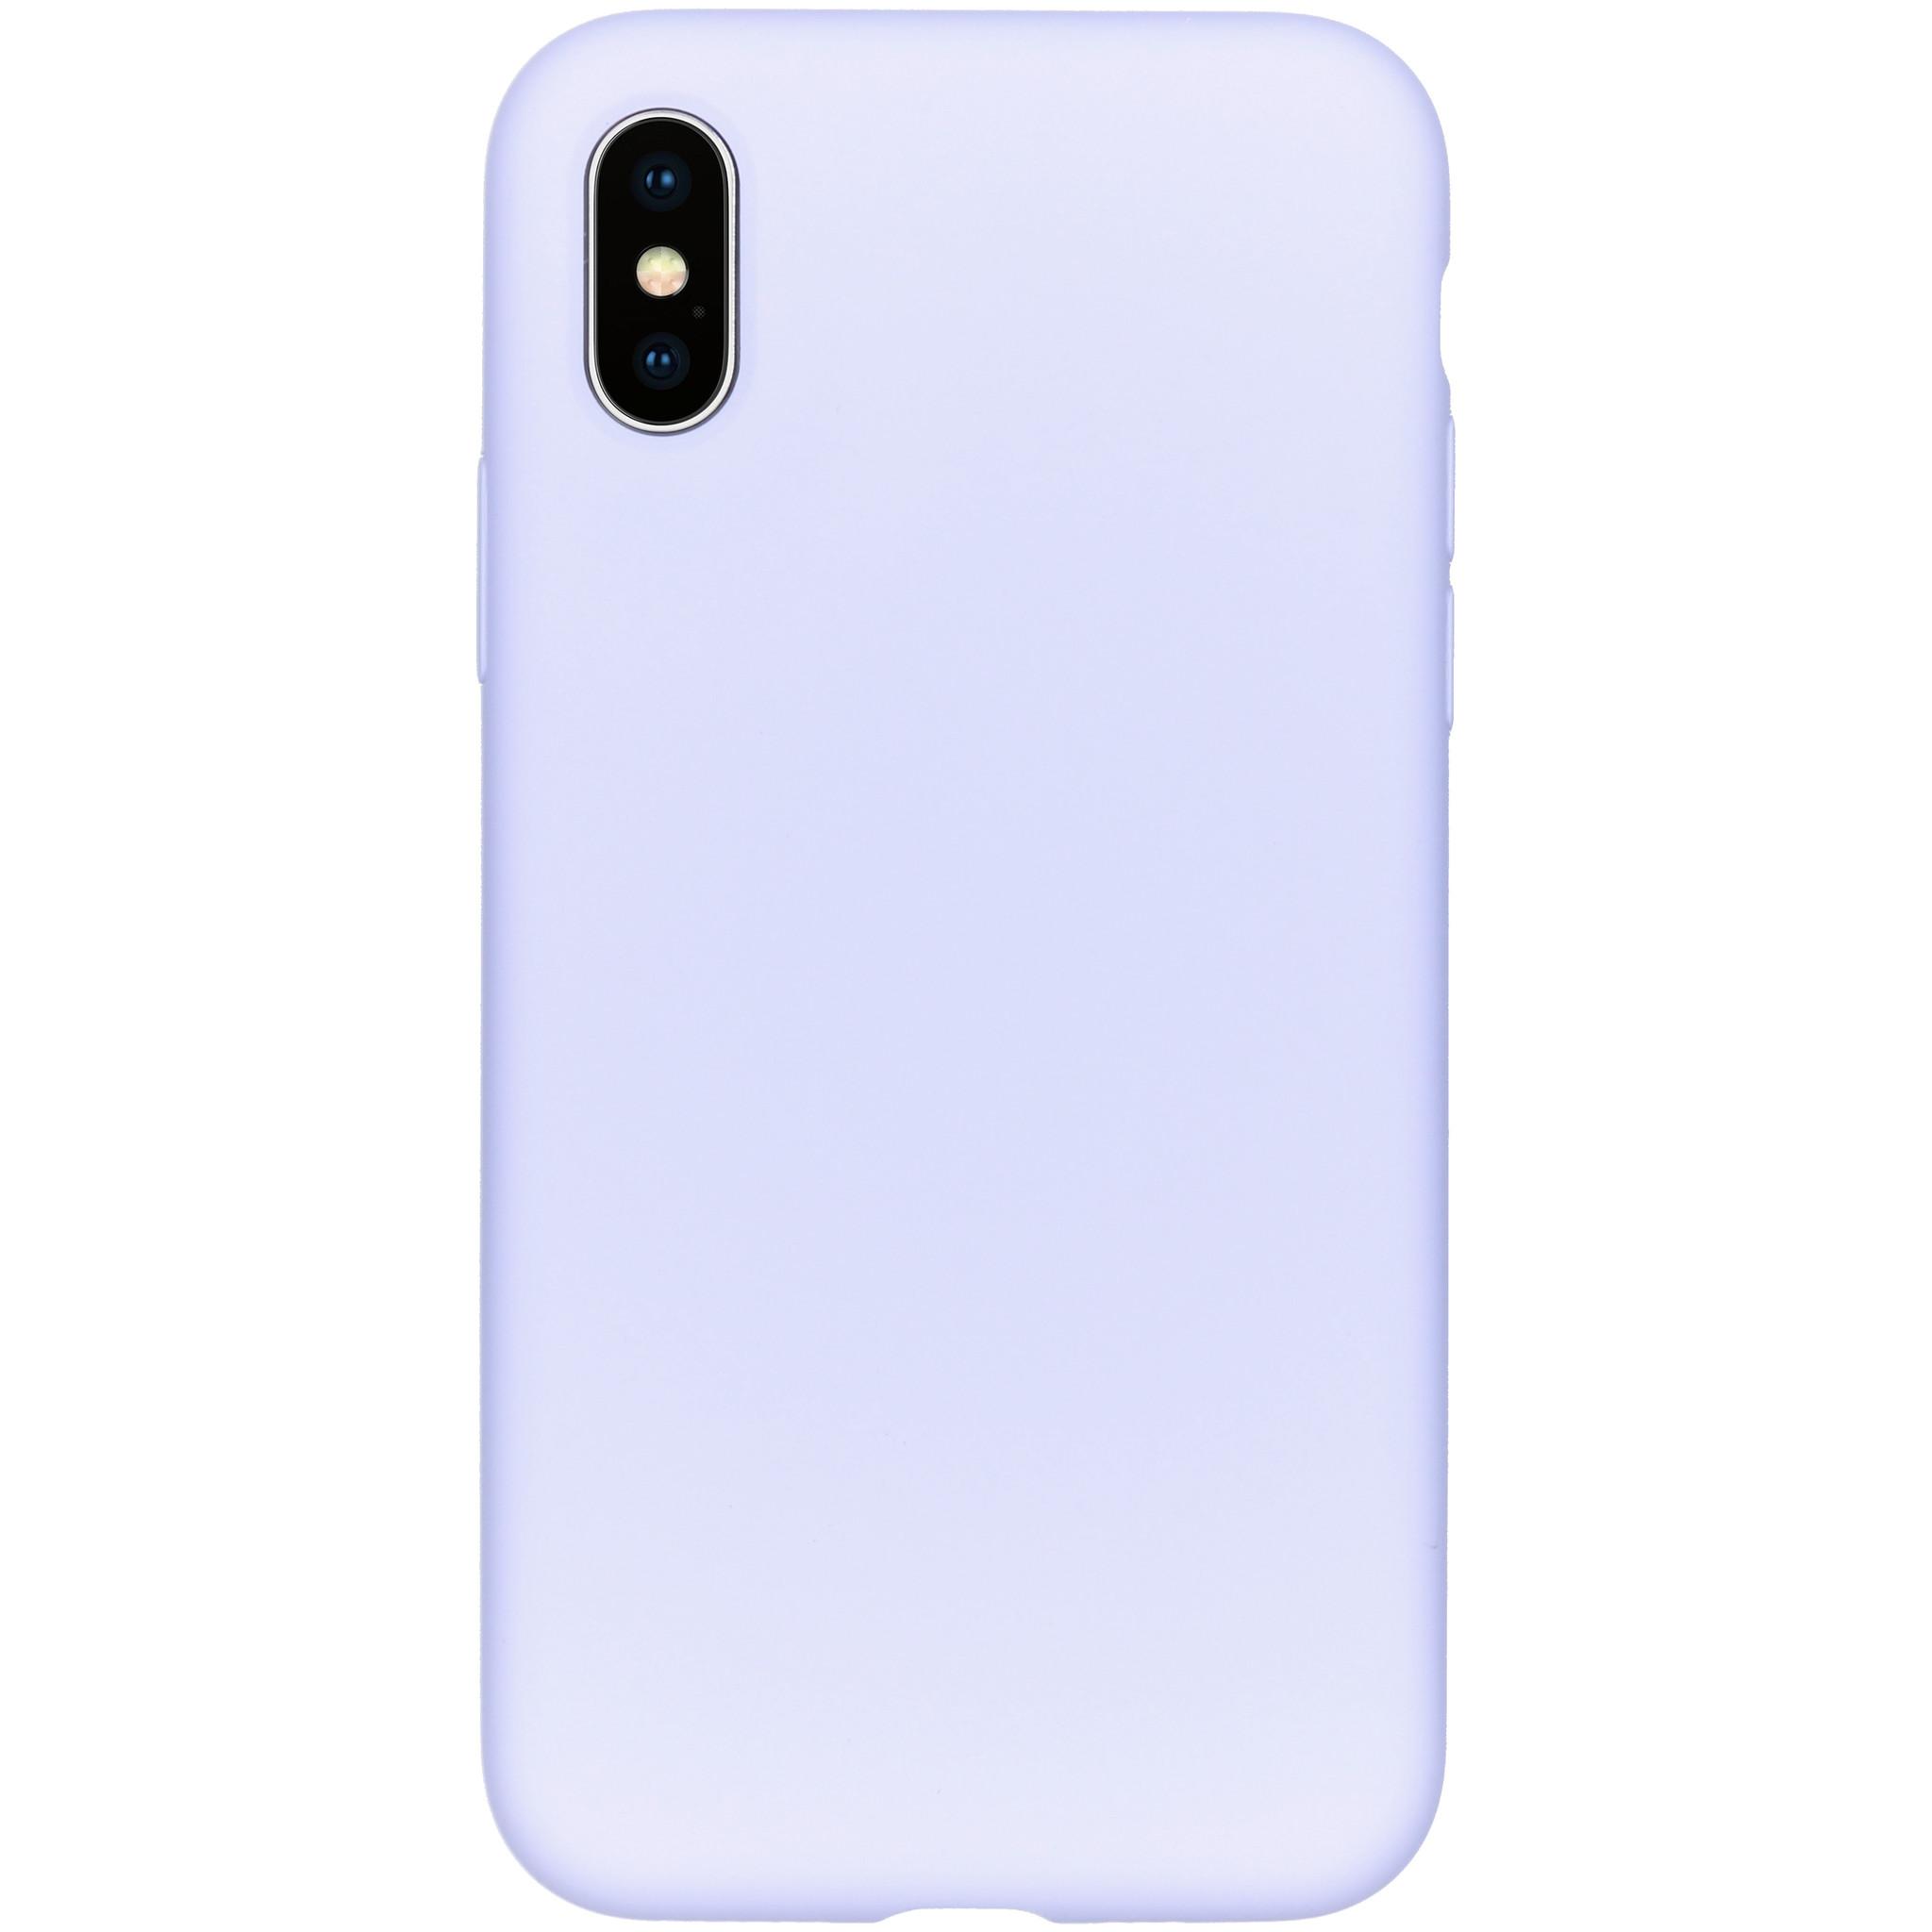 Accezz Liquid Silikoncase Lila für das iPhone Xs / X